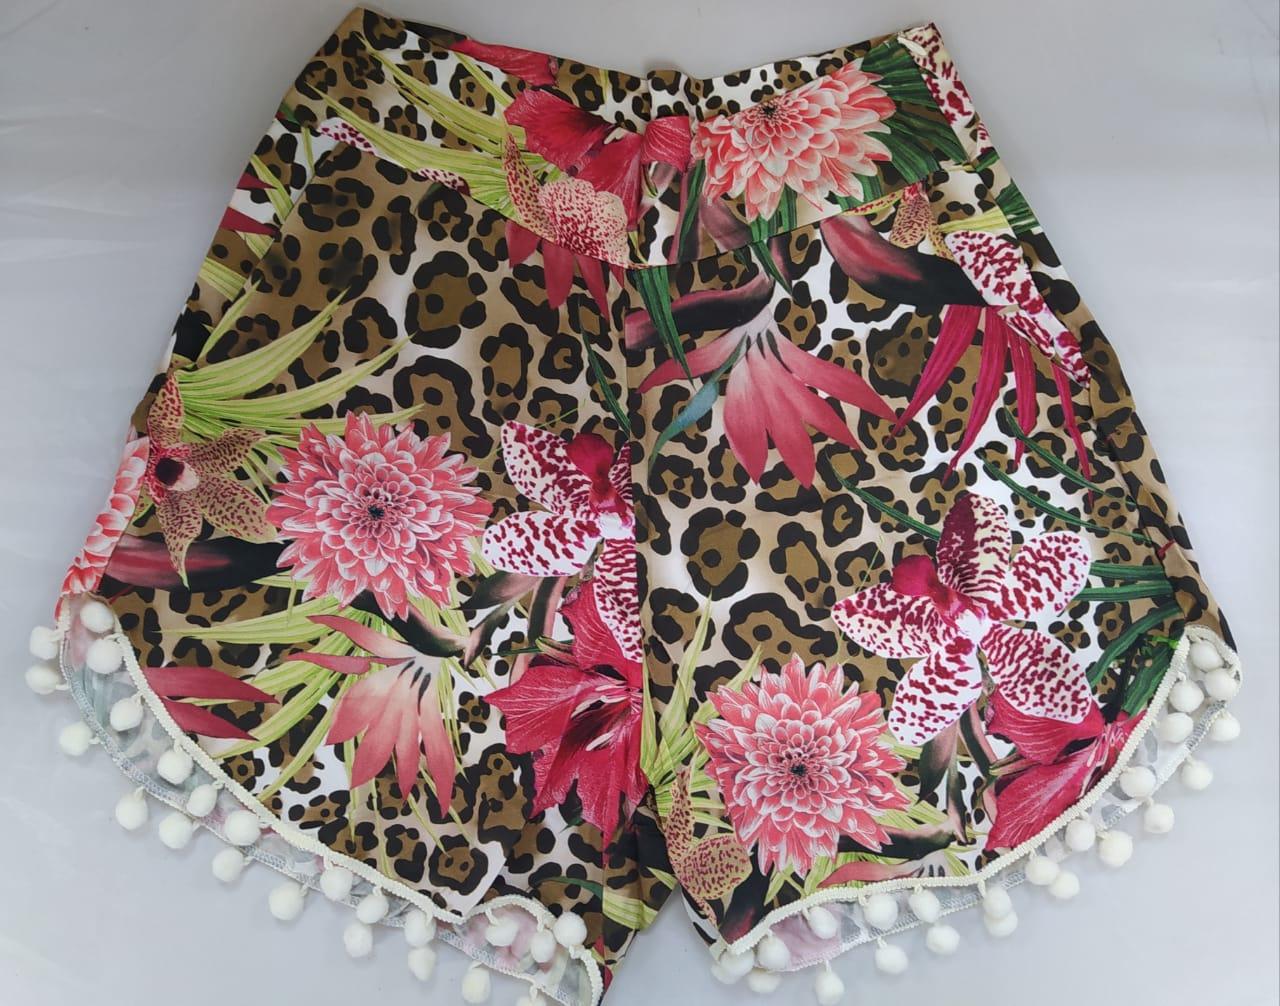 Conjunto resort shorts e cropped estampa animal print onça com floral